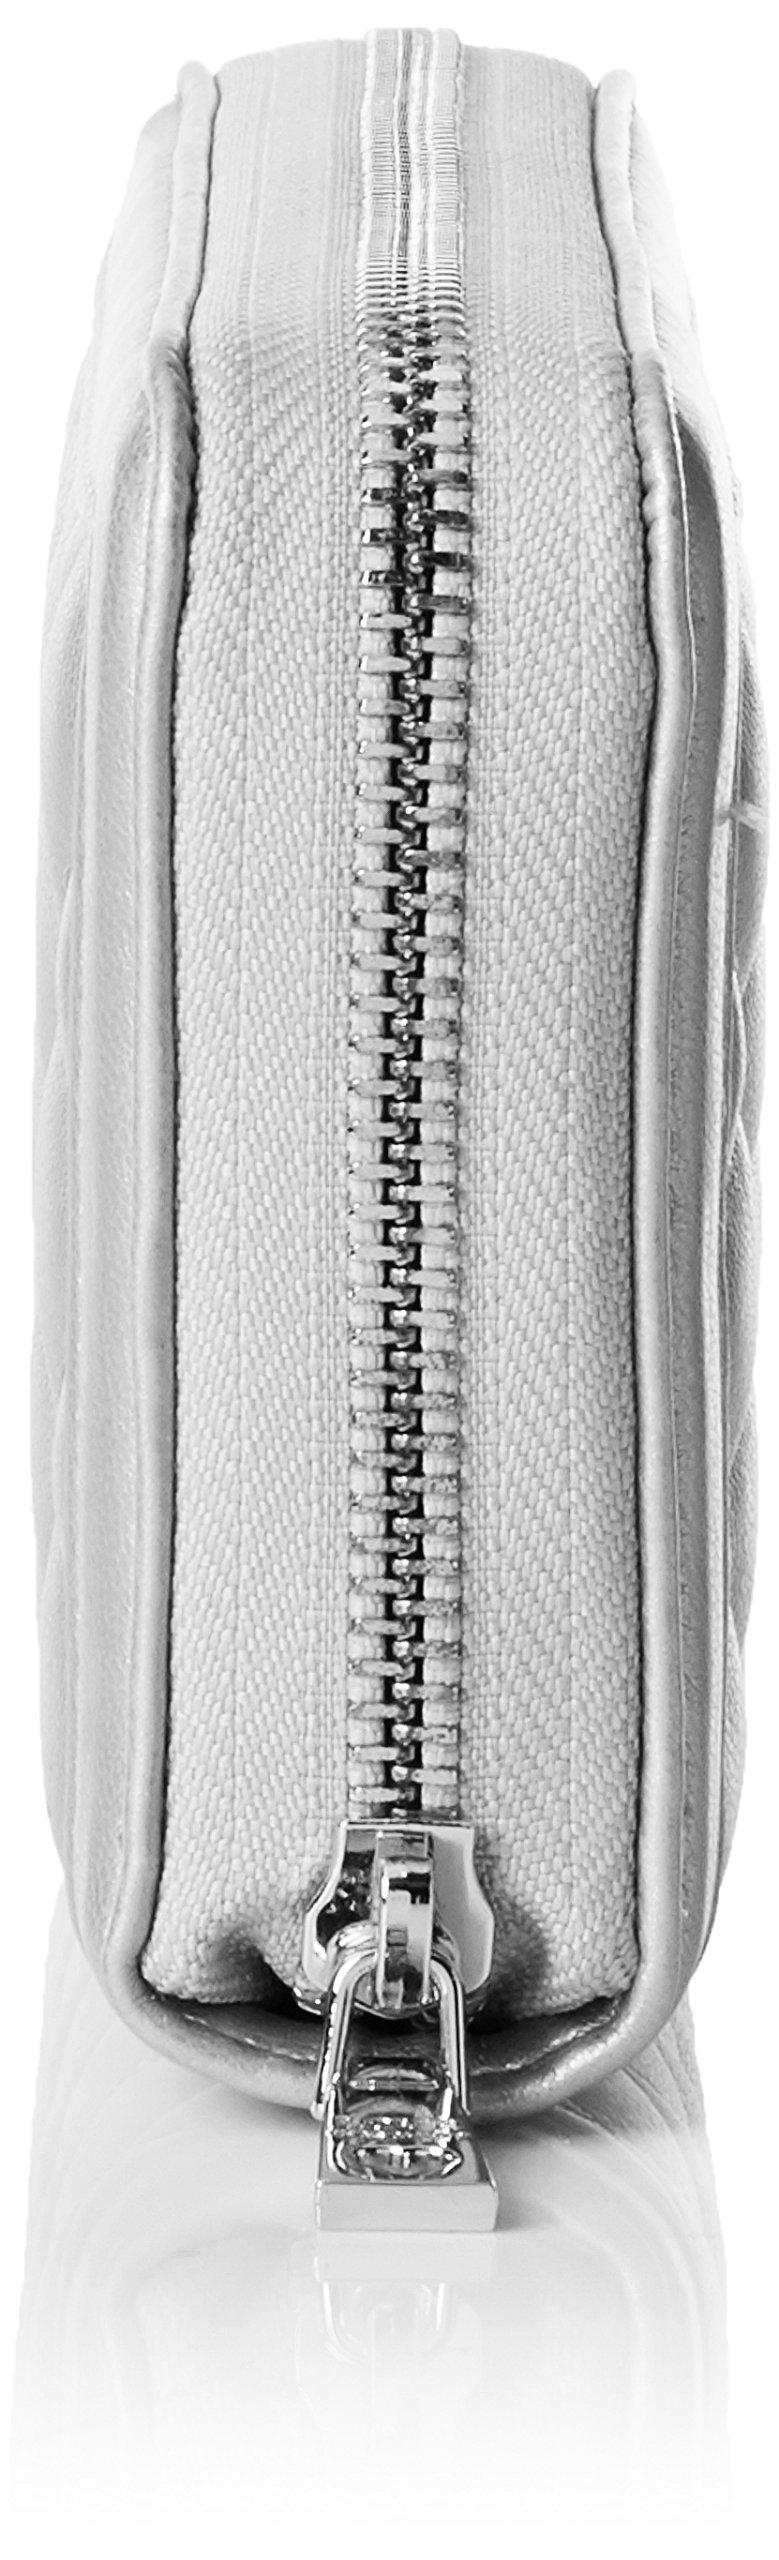 Love Moschino Portaf.quilted Metallic Pu Argento, Women's Clutch, Silver, 3x10x20 cm (B x H T) by Love Moschino (Image #3)